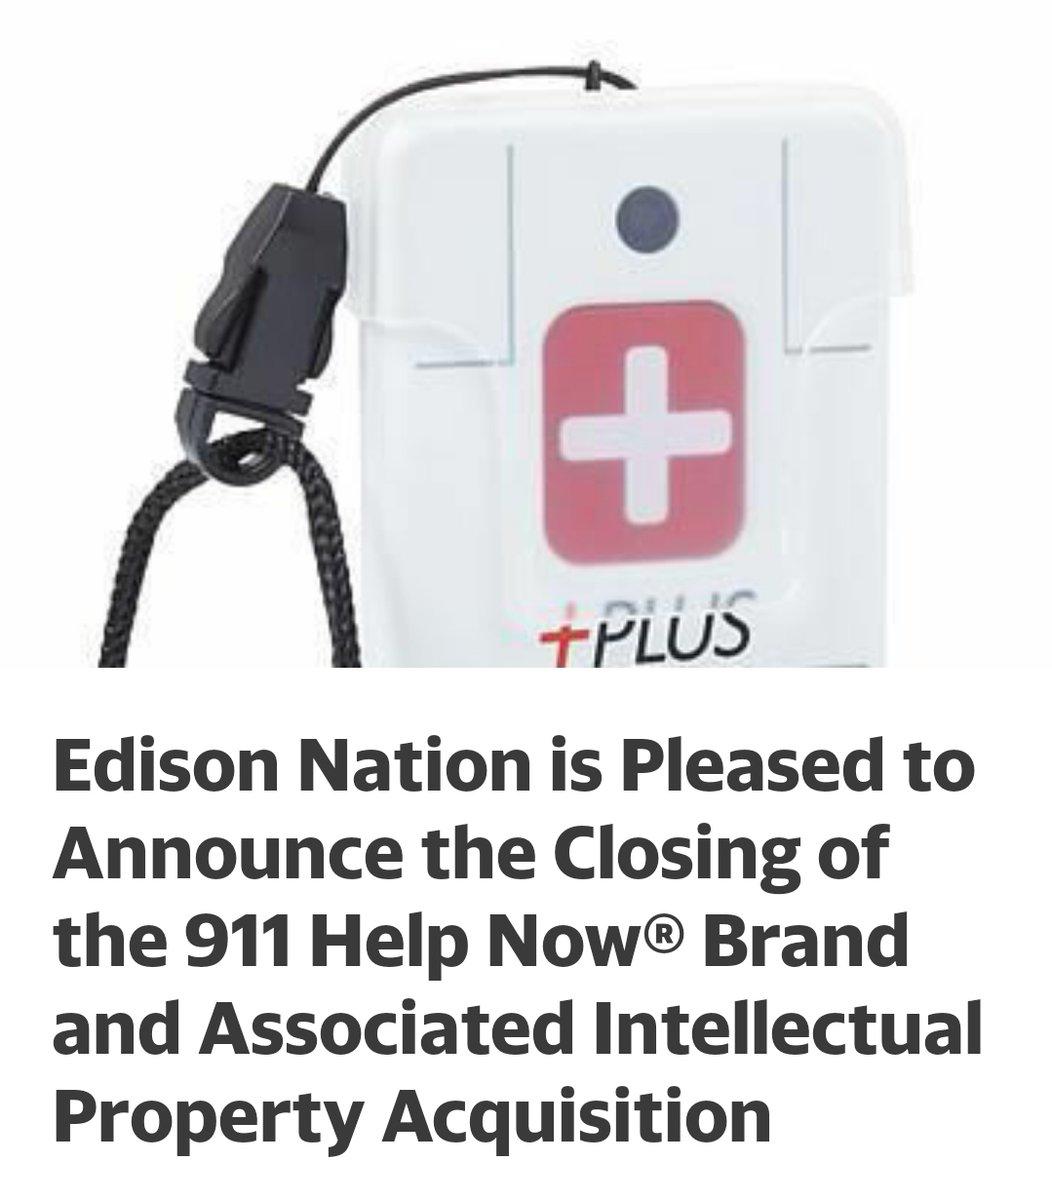 $EDNT Announce the Closing of the 911 Help Now® Brand https://t.co/9UDVKtS3cB  #cannabis #marijuana #CBD #wsj #nytimes #business #reuters #IHub_StockPosts #forbes #marketwatch #cnn #bet #foxnews #latimes #Crainschicago #usatoday #cnnmoneyinvest #ESPN #WGN #Accredited #Investors https://t.co/hP1XYqD2eI